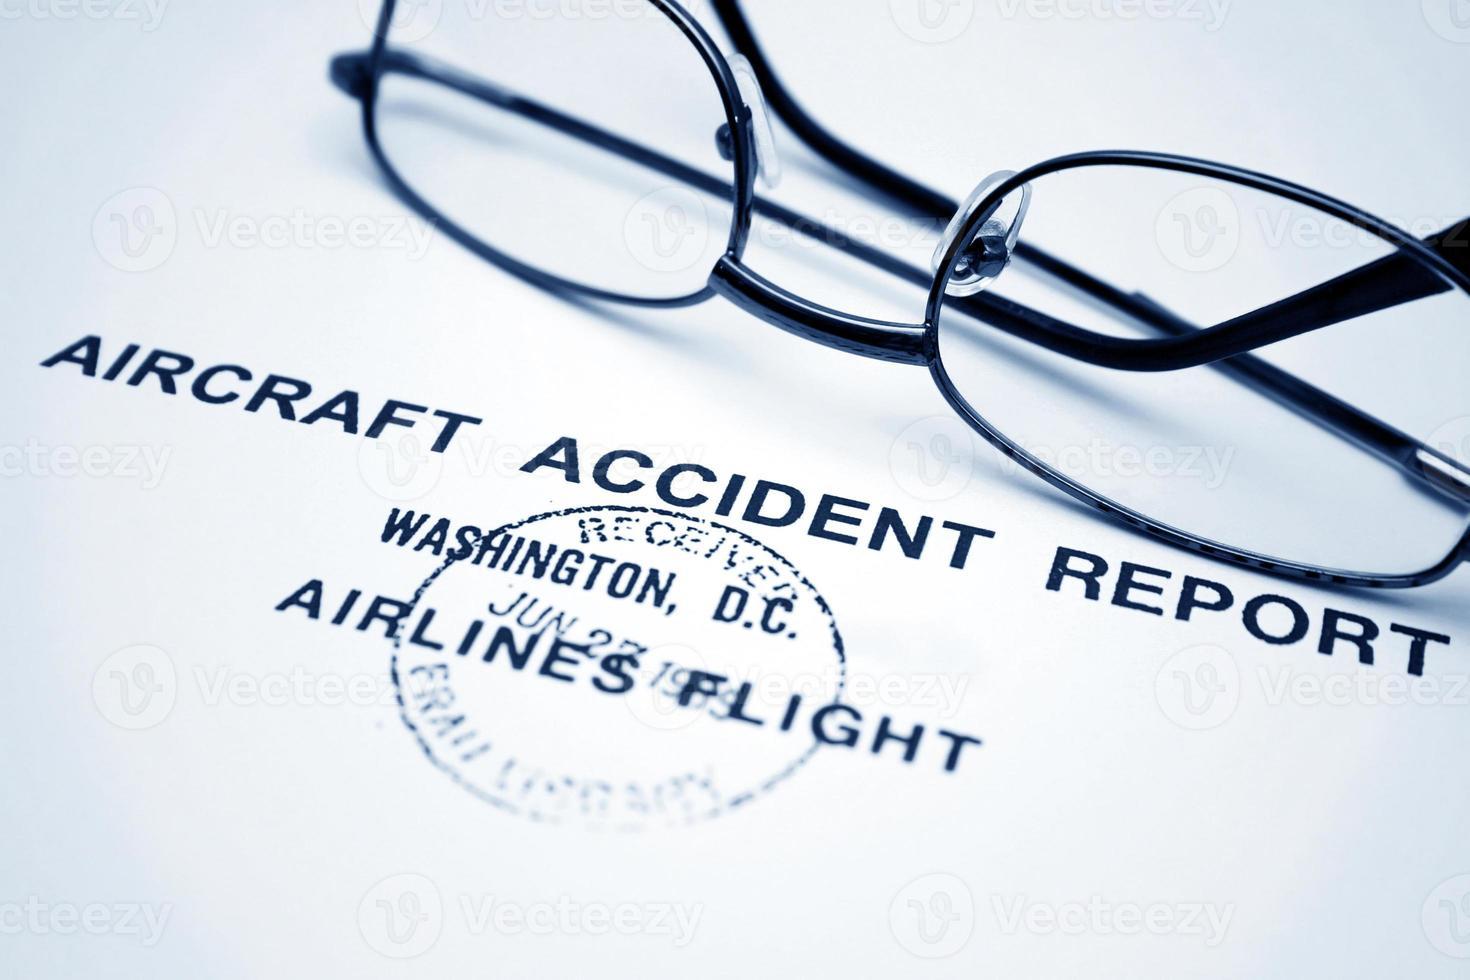 Flugzeugunfallbericht foto